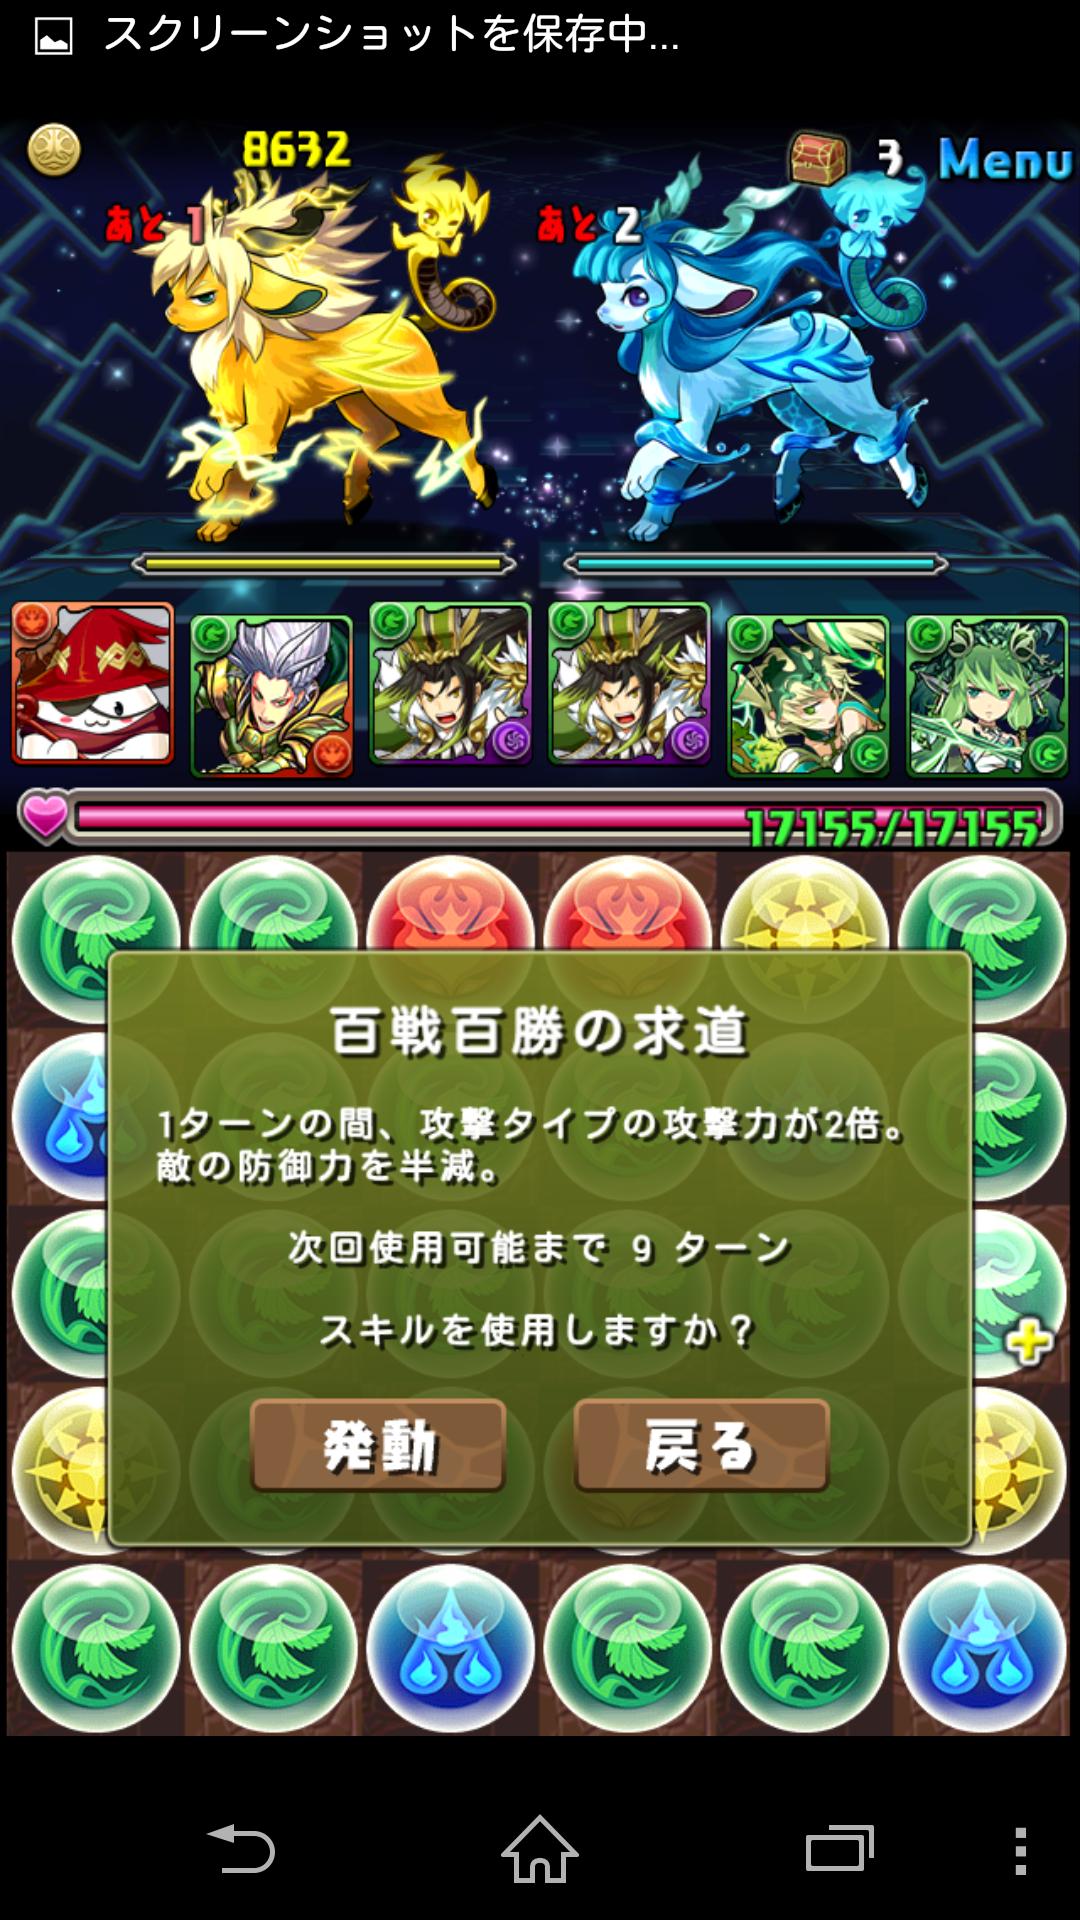 Screenshot_2015-02-20-22-11-41.png